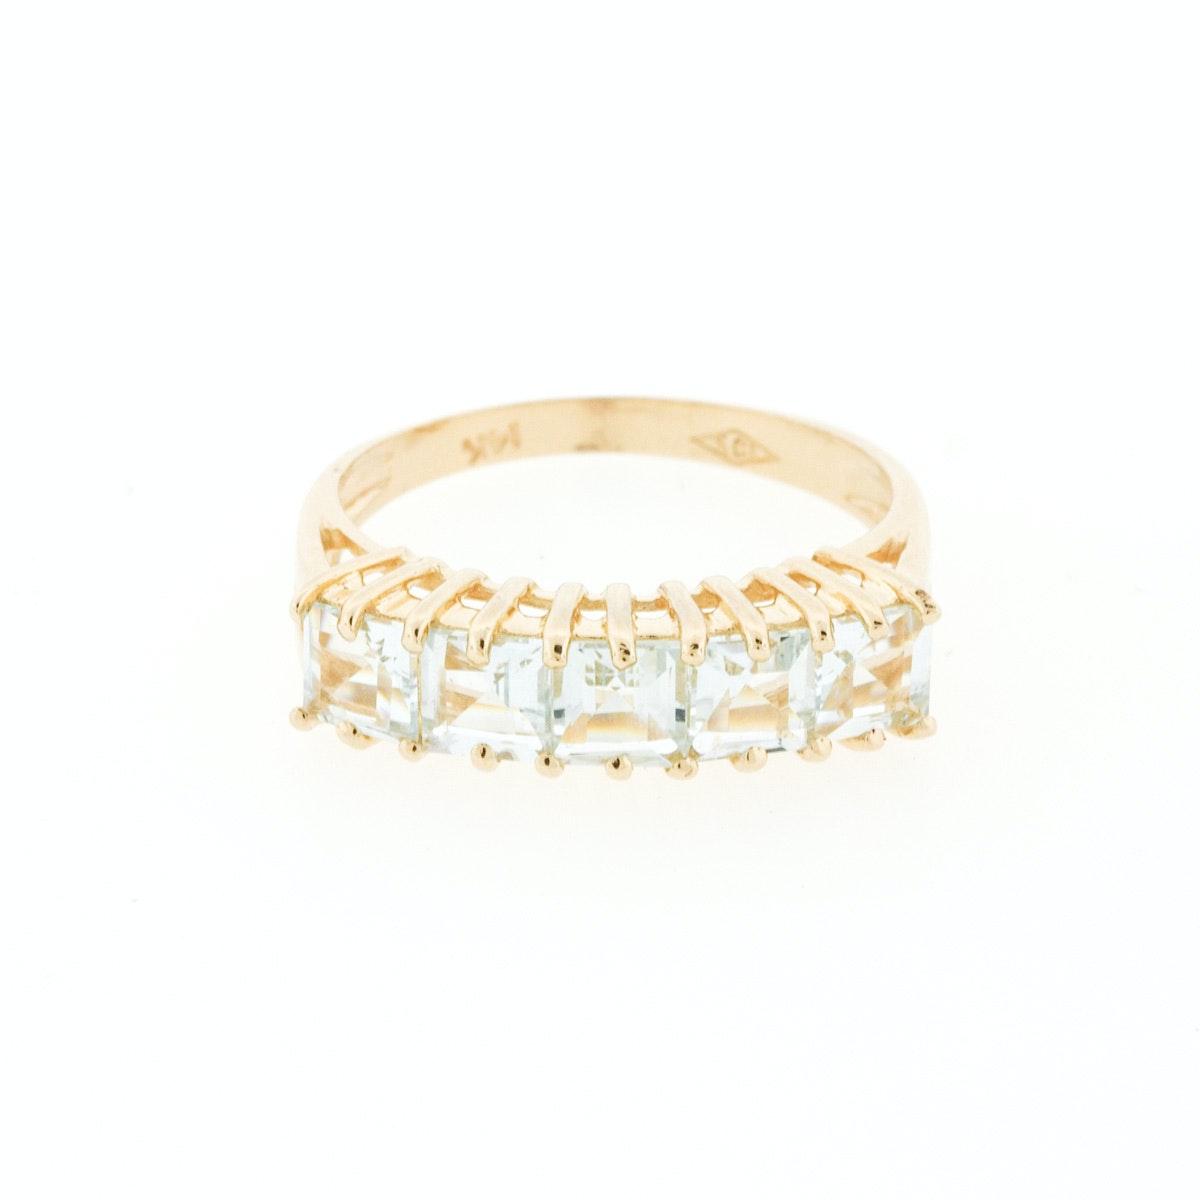 14K Yellow Gold Band with Five Princess Cut Aquamarine Stones